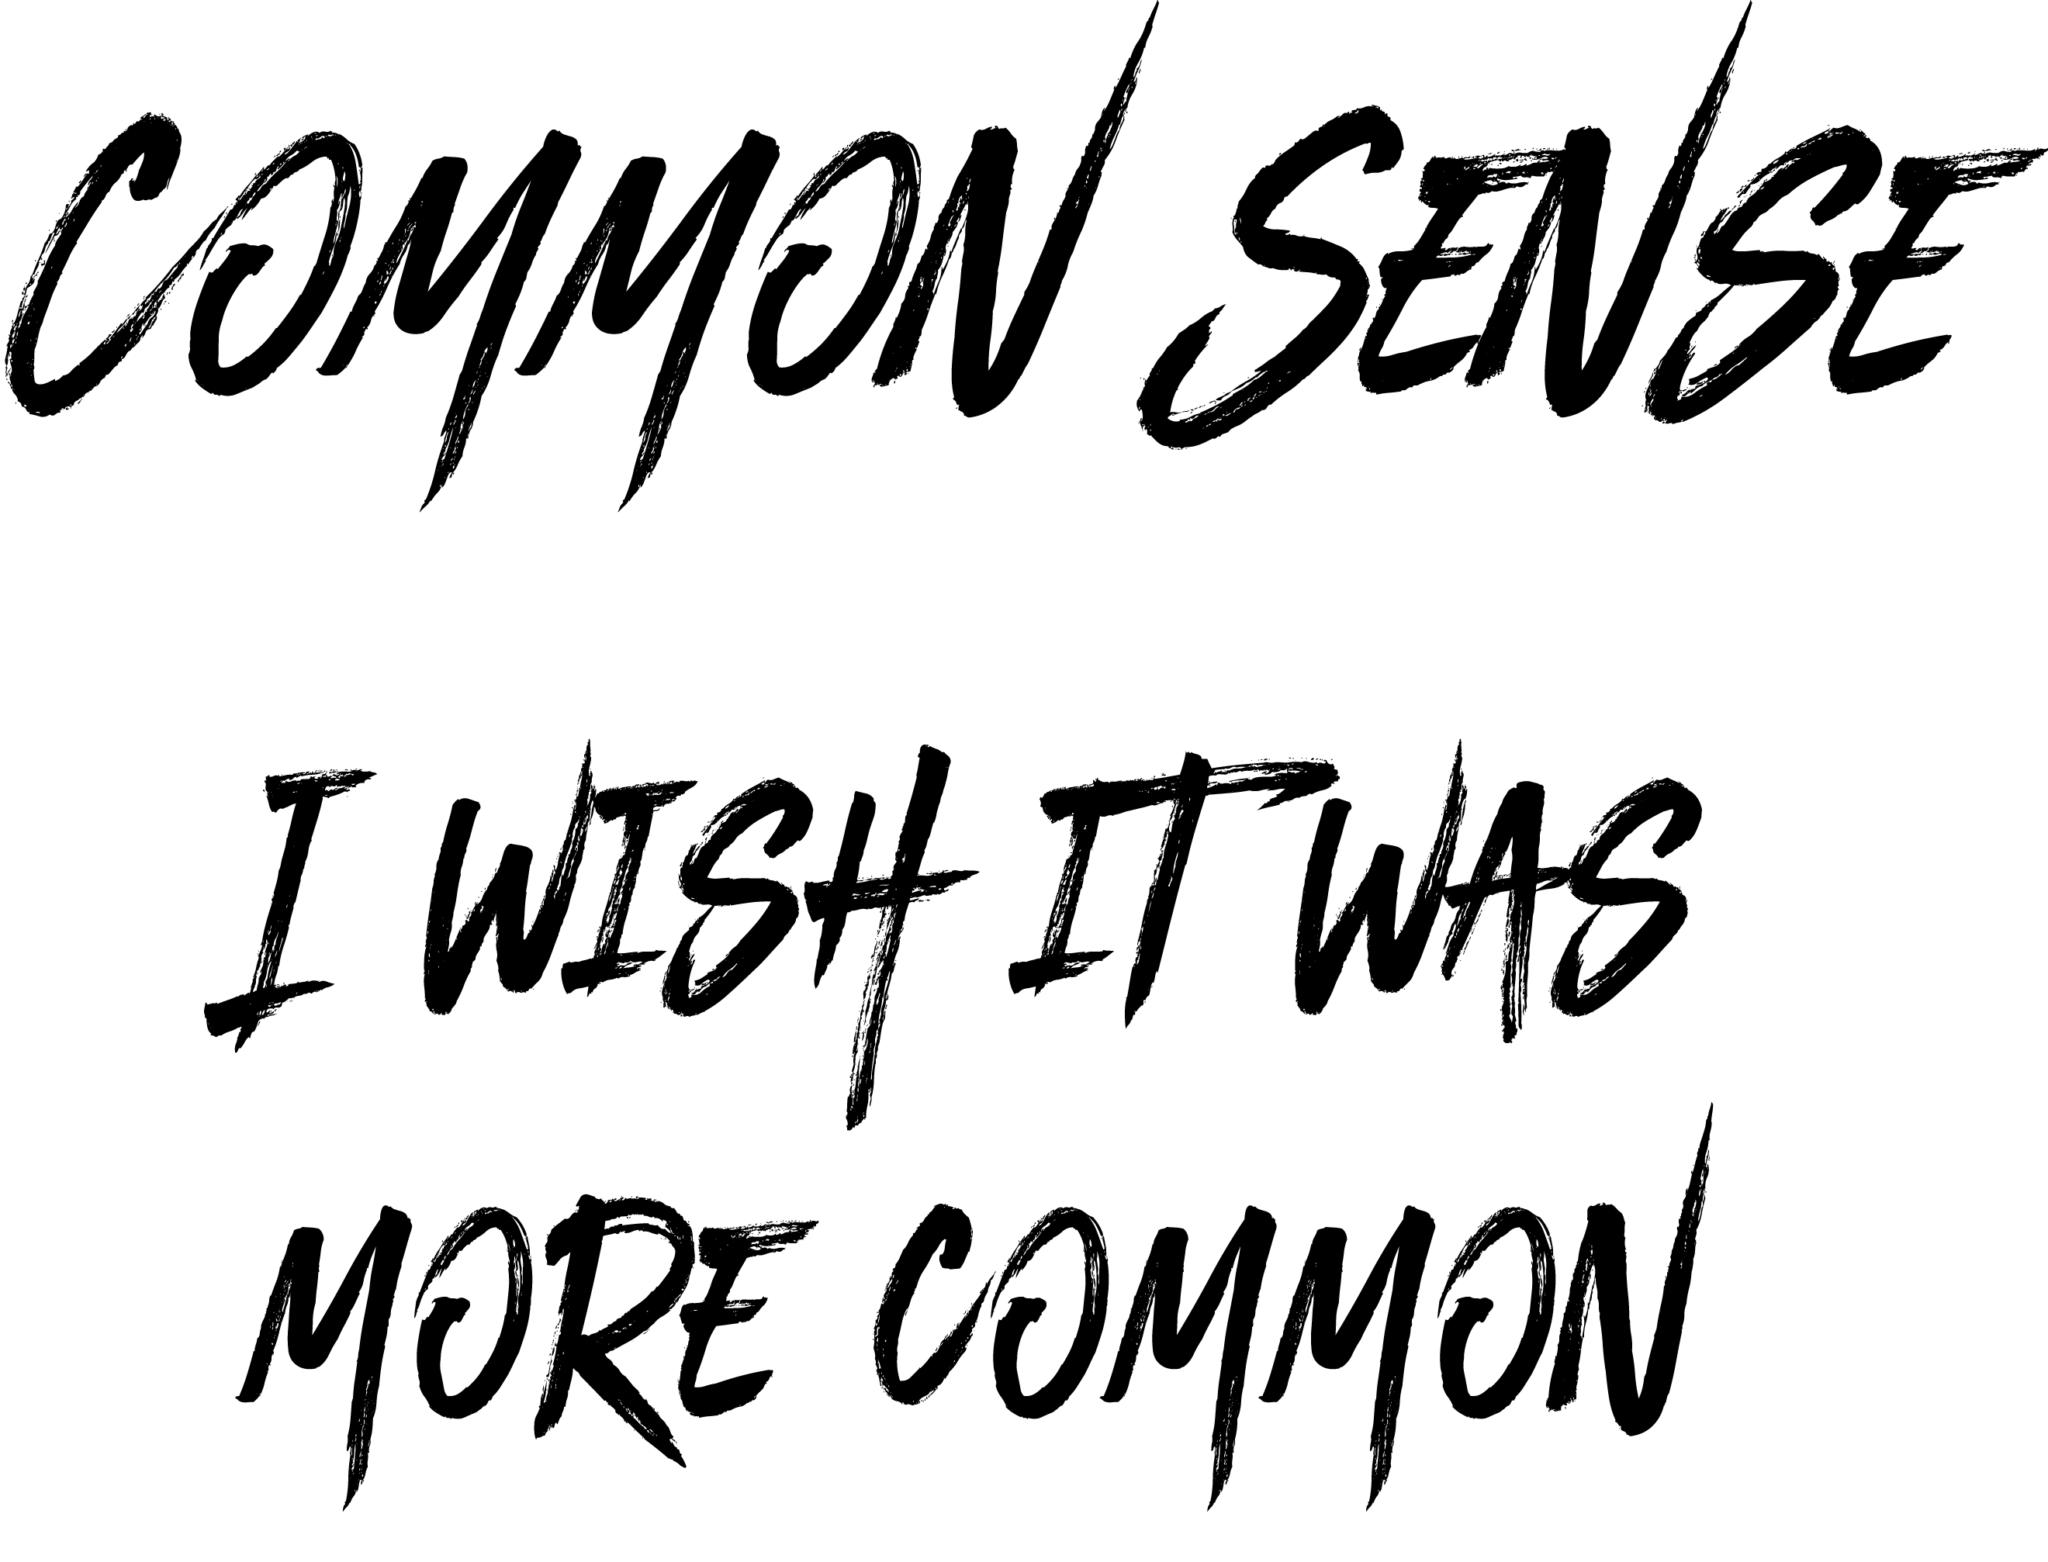 CommonSense